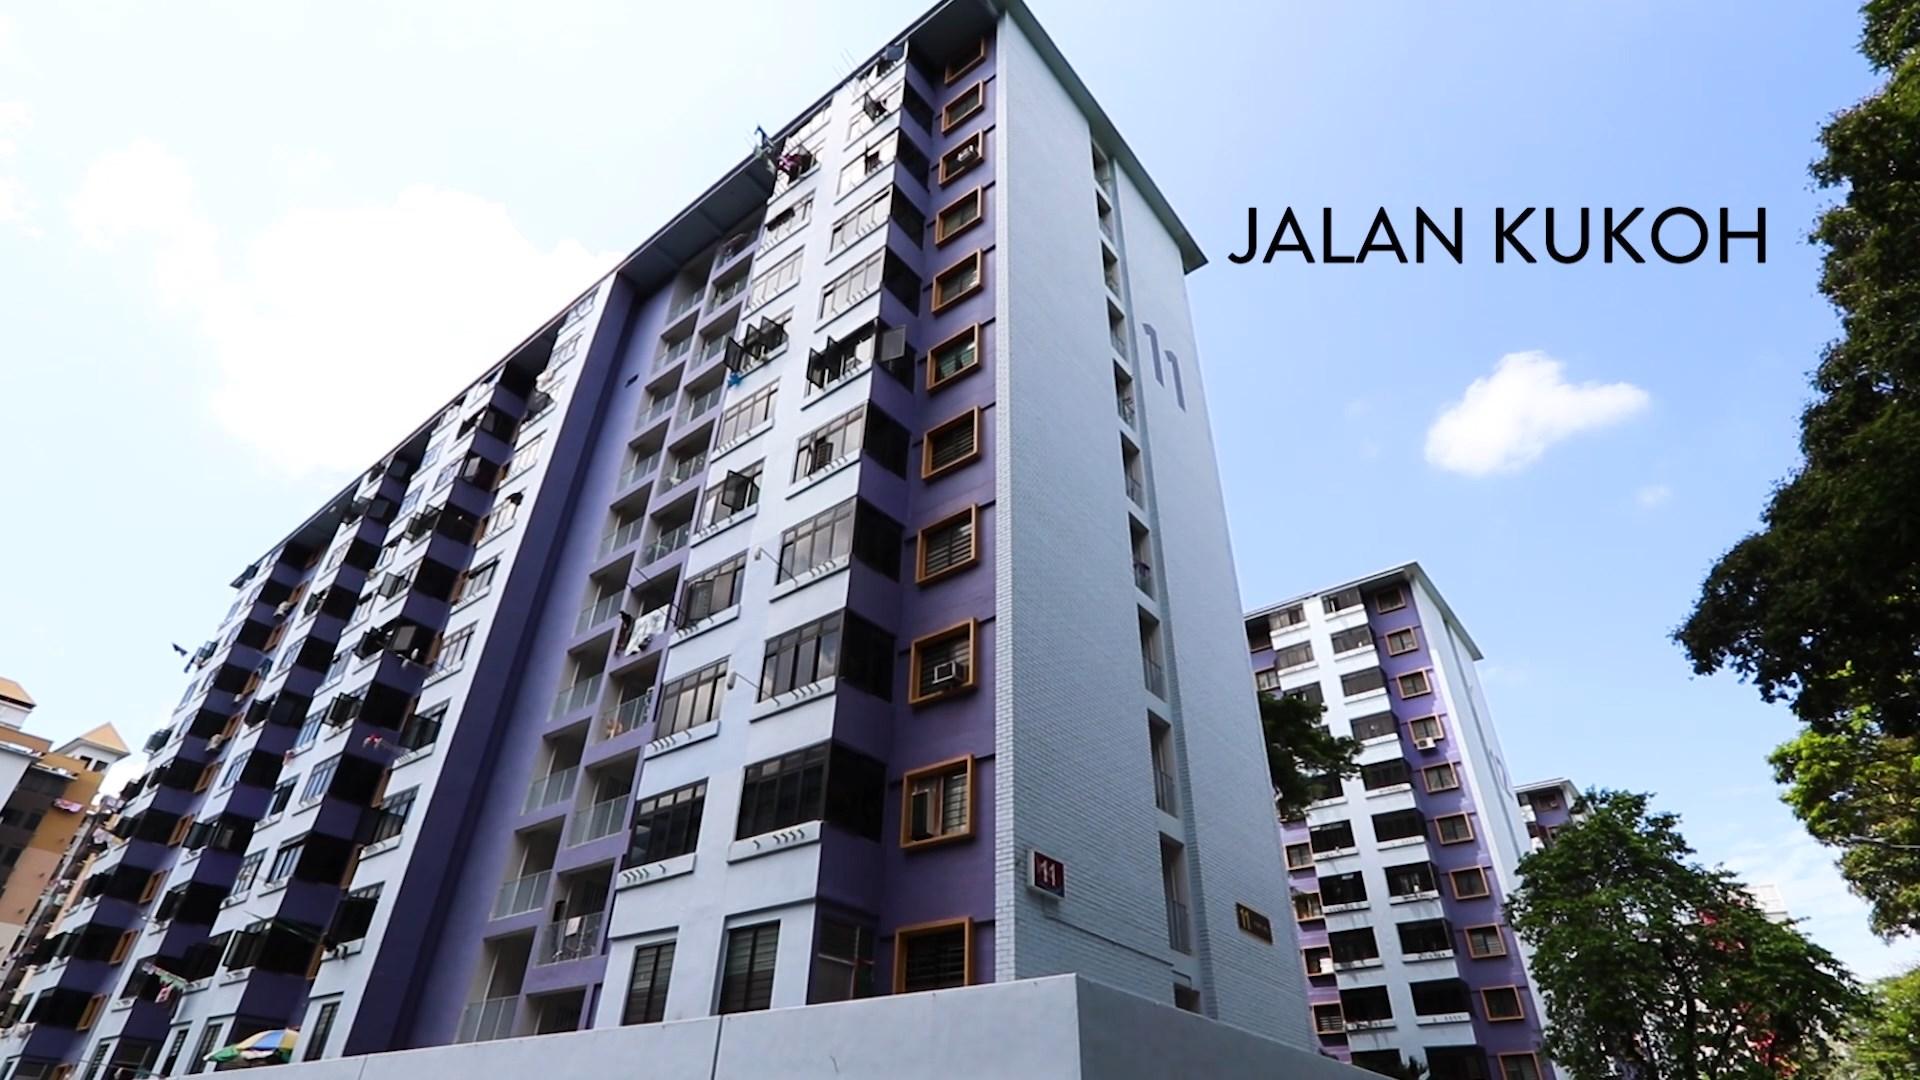 Jalan Kukoh Short Documentary screenshot.jpg